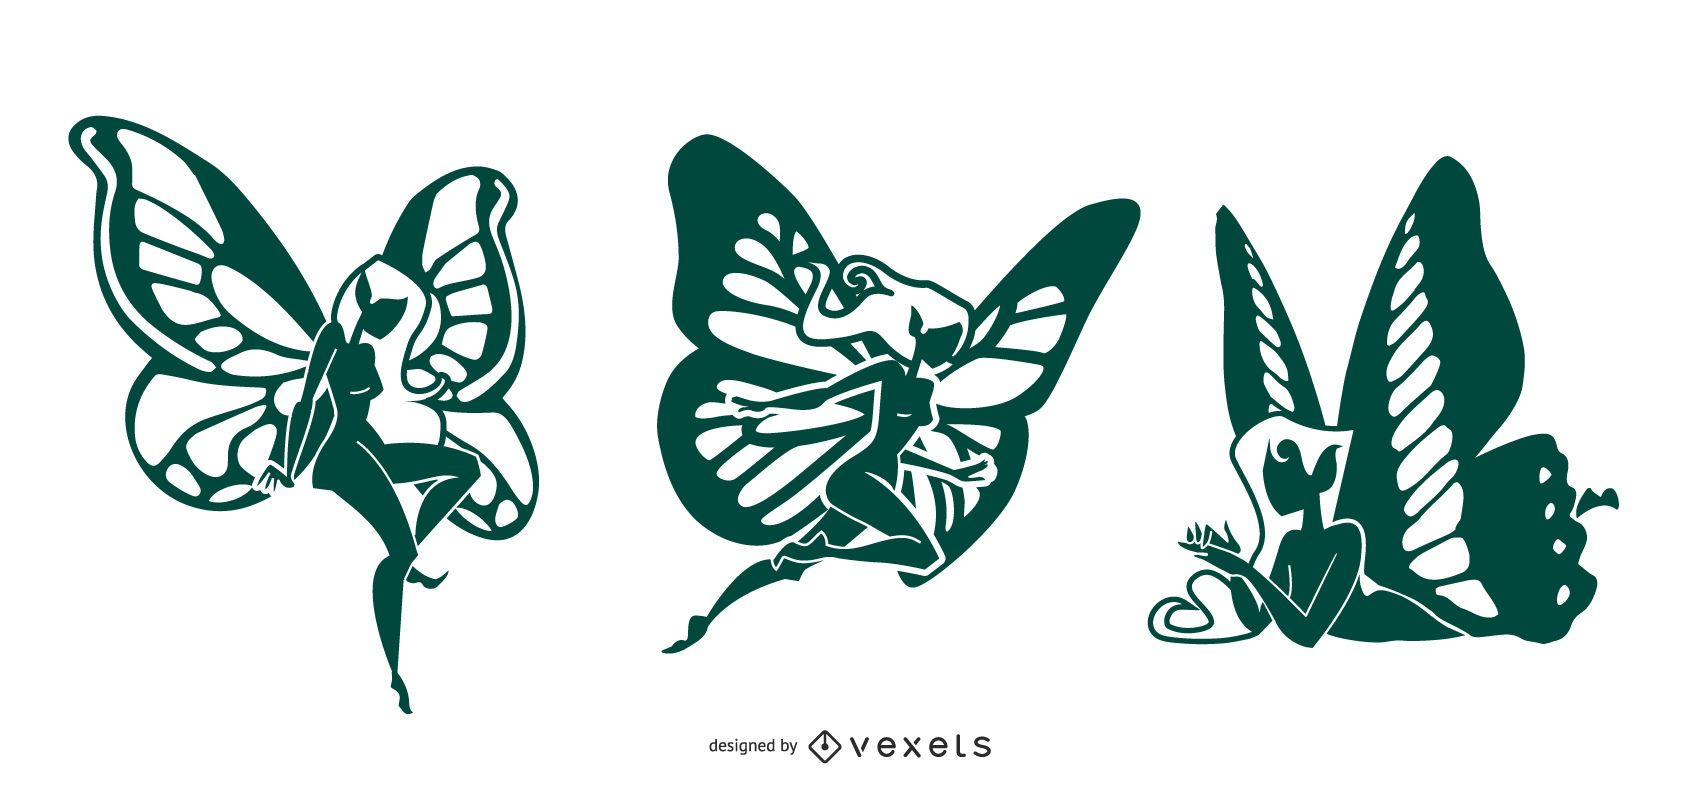 Fairies Silhouette Design